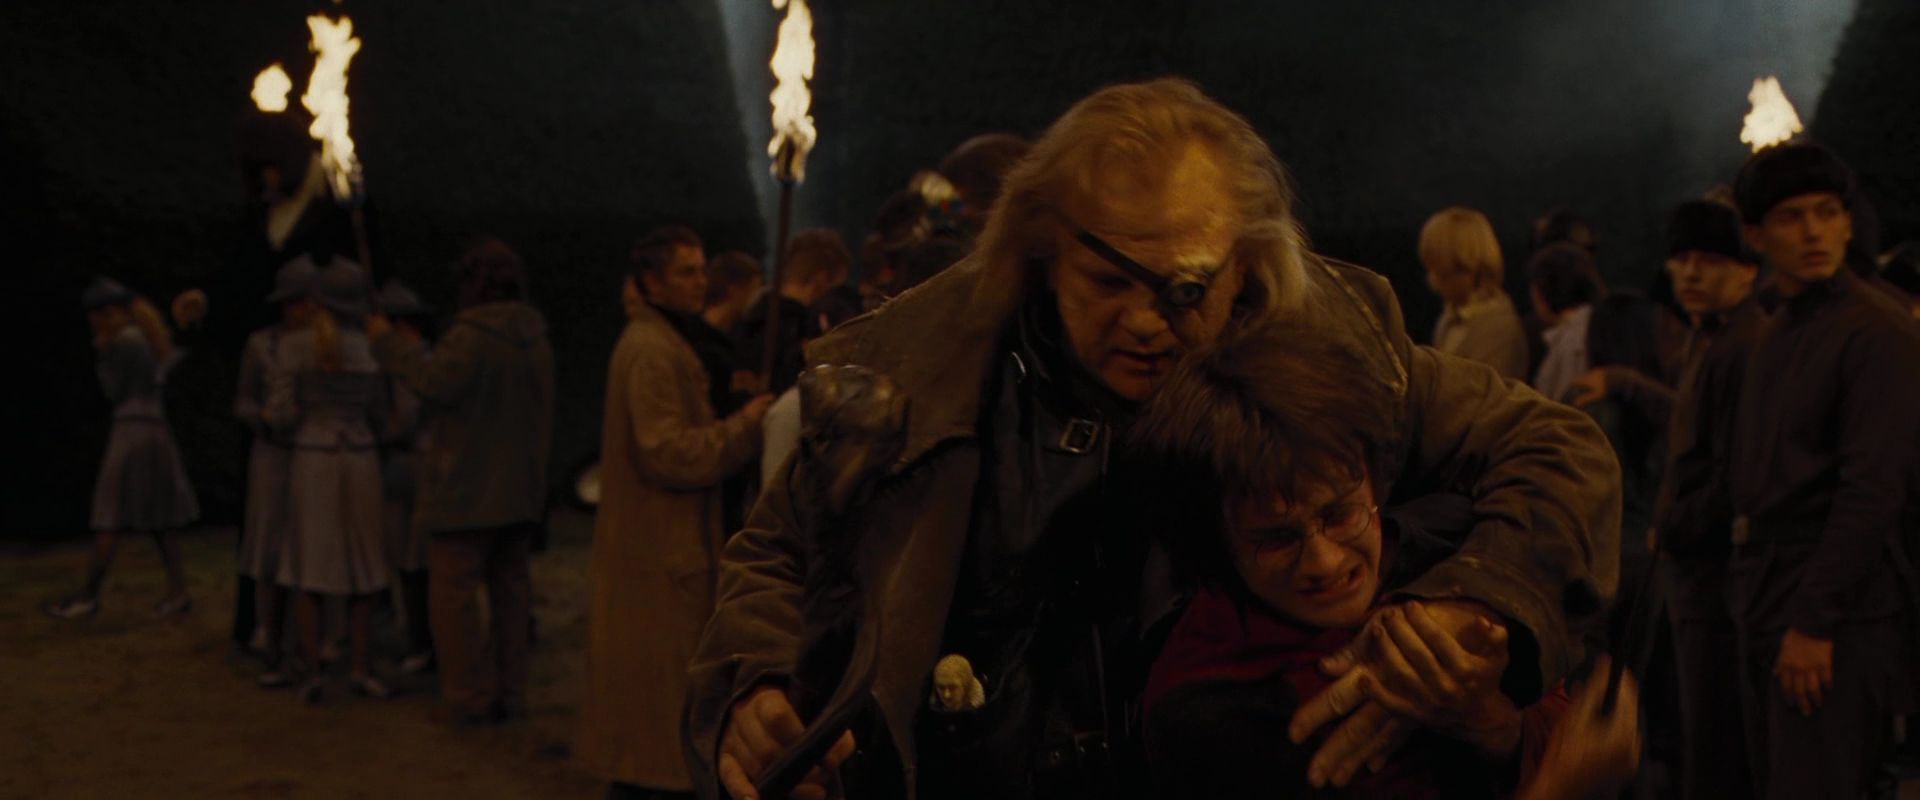 Harry Potter Book Goblet Of Fire Pdf : Harry potter and the goblet of fire pdf gamest